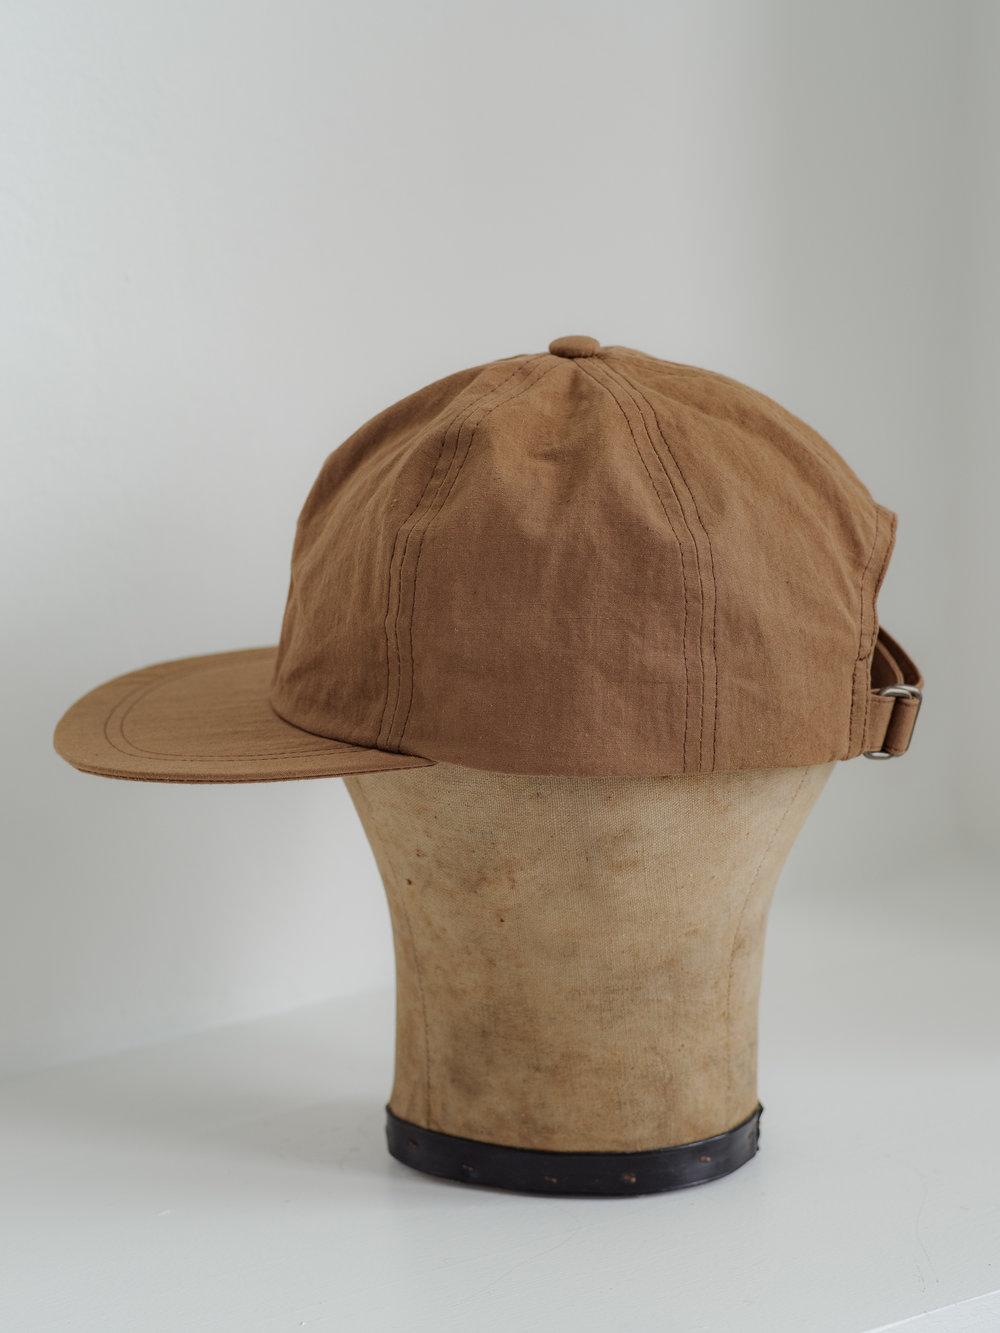 evan-kinori-ouji-yamada-handmade-hat-2